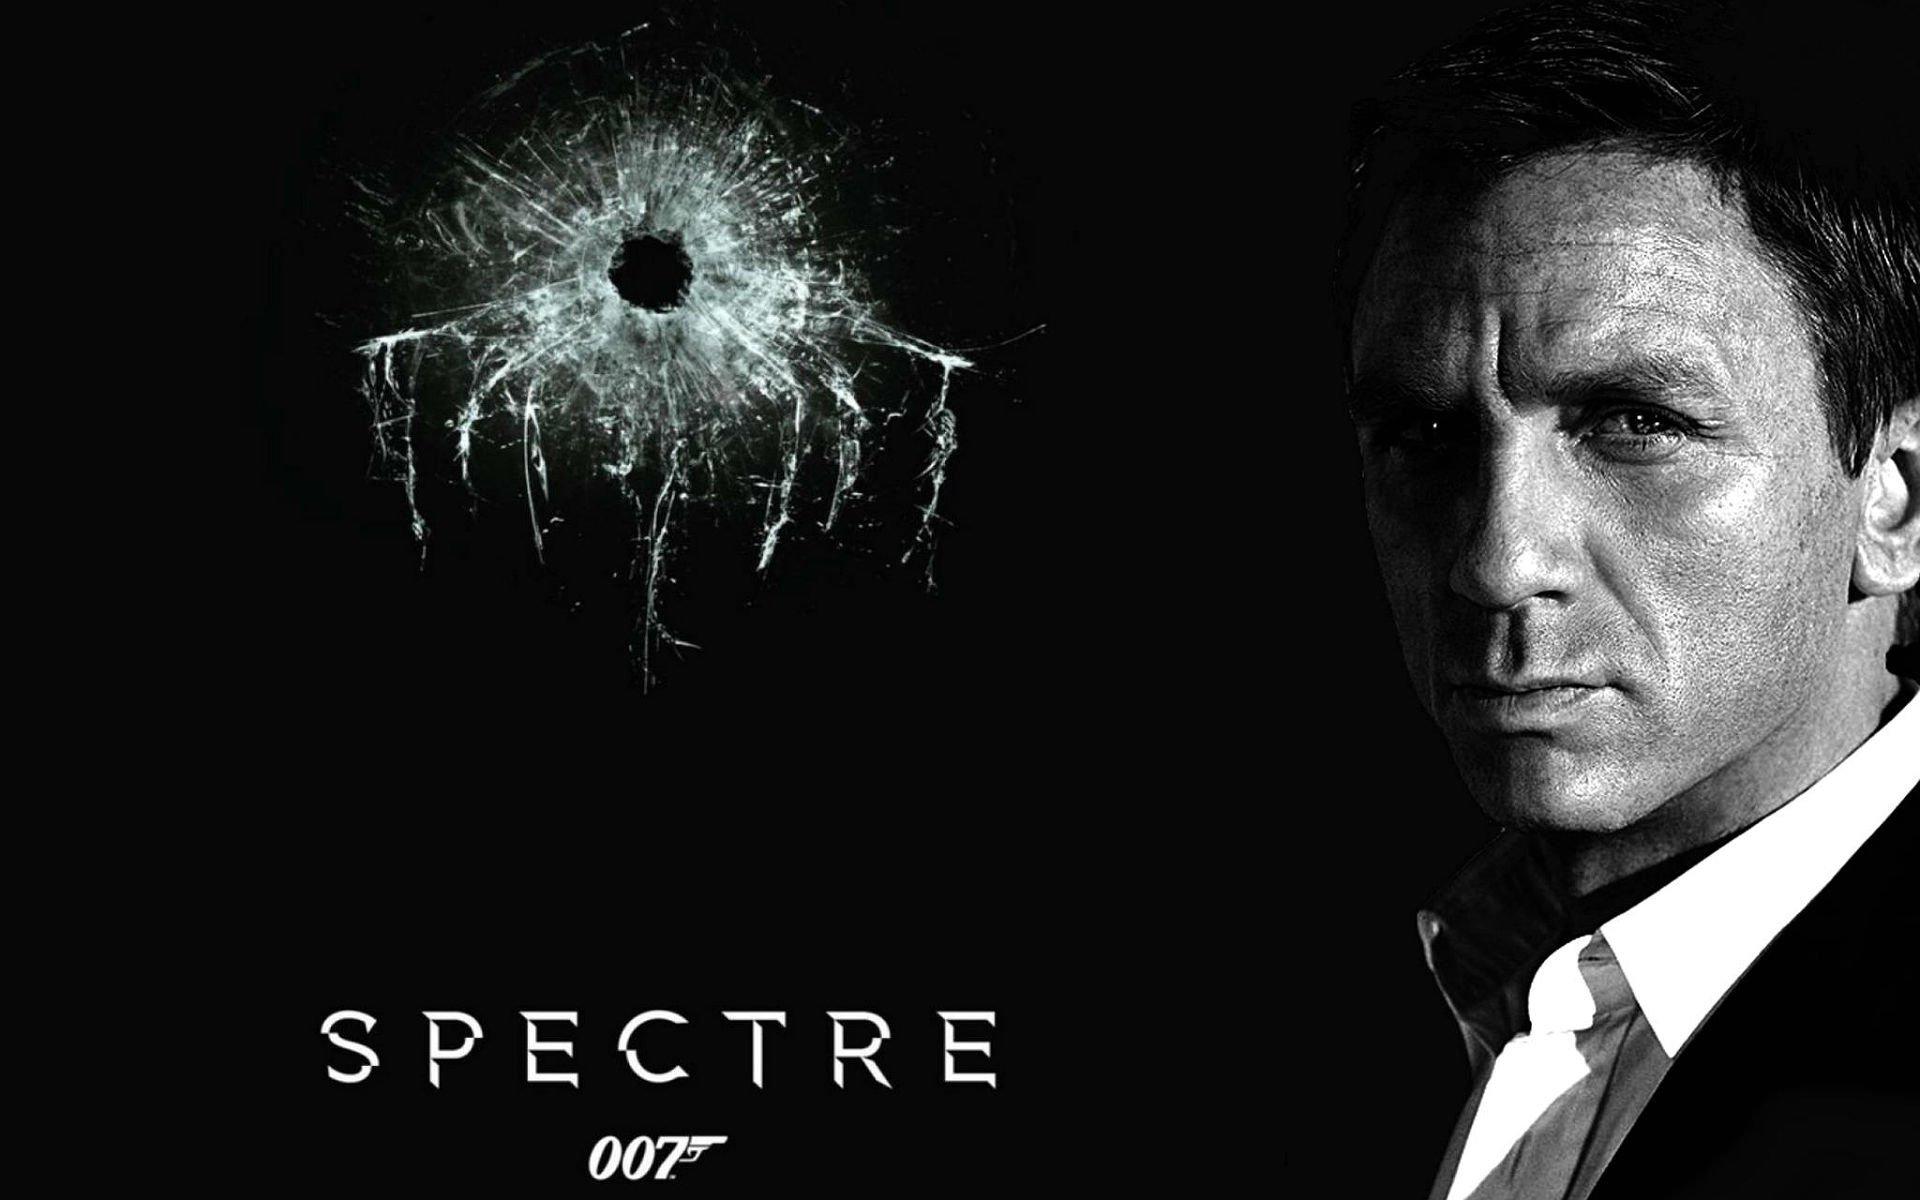 SPECTRE BOND 24 james action spy crime thriller mystery 1spectre 007 1920x1200